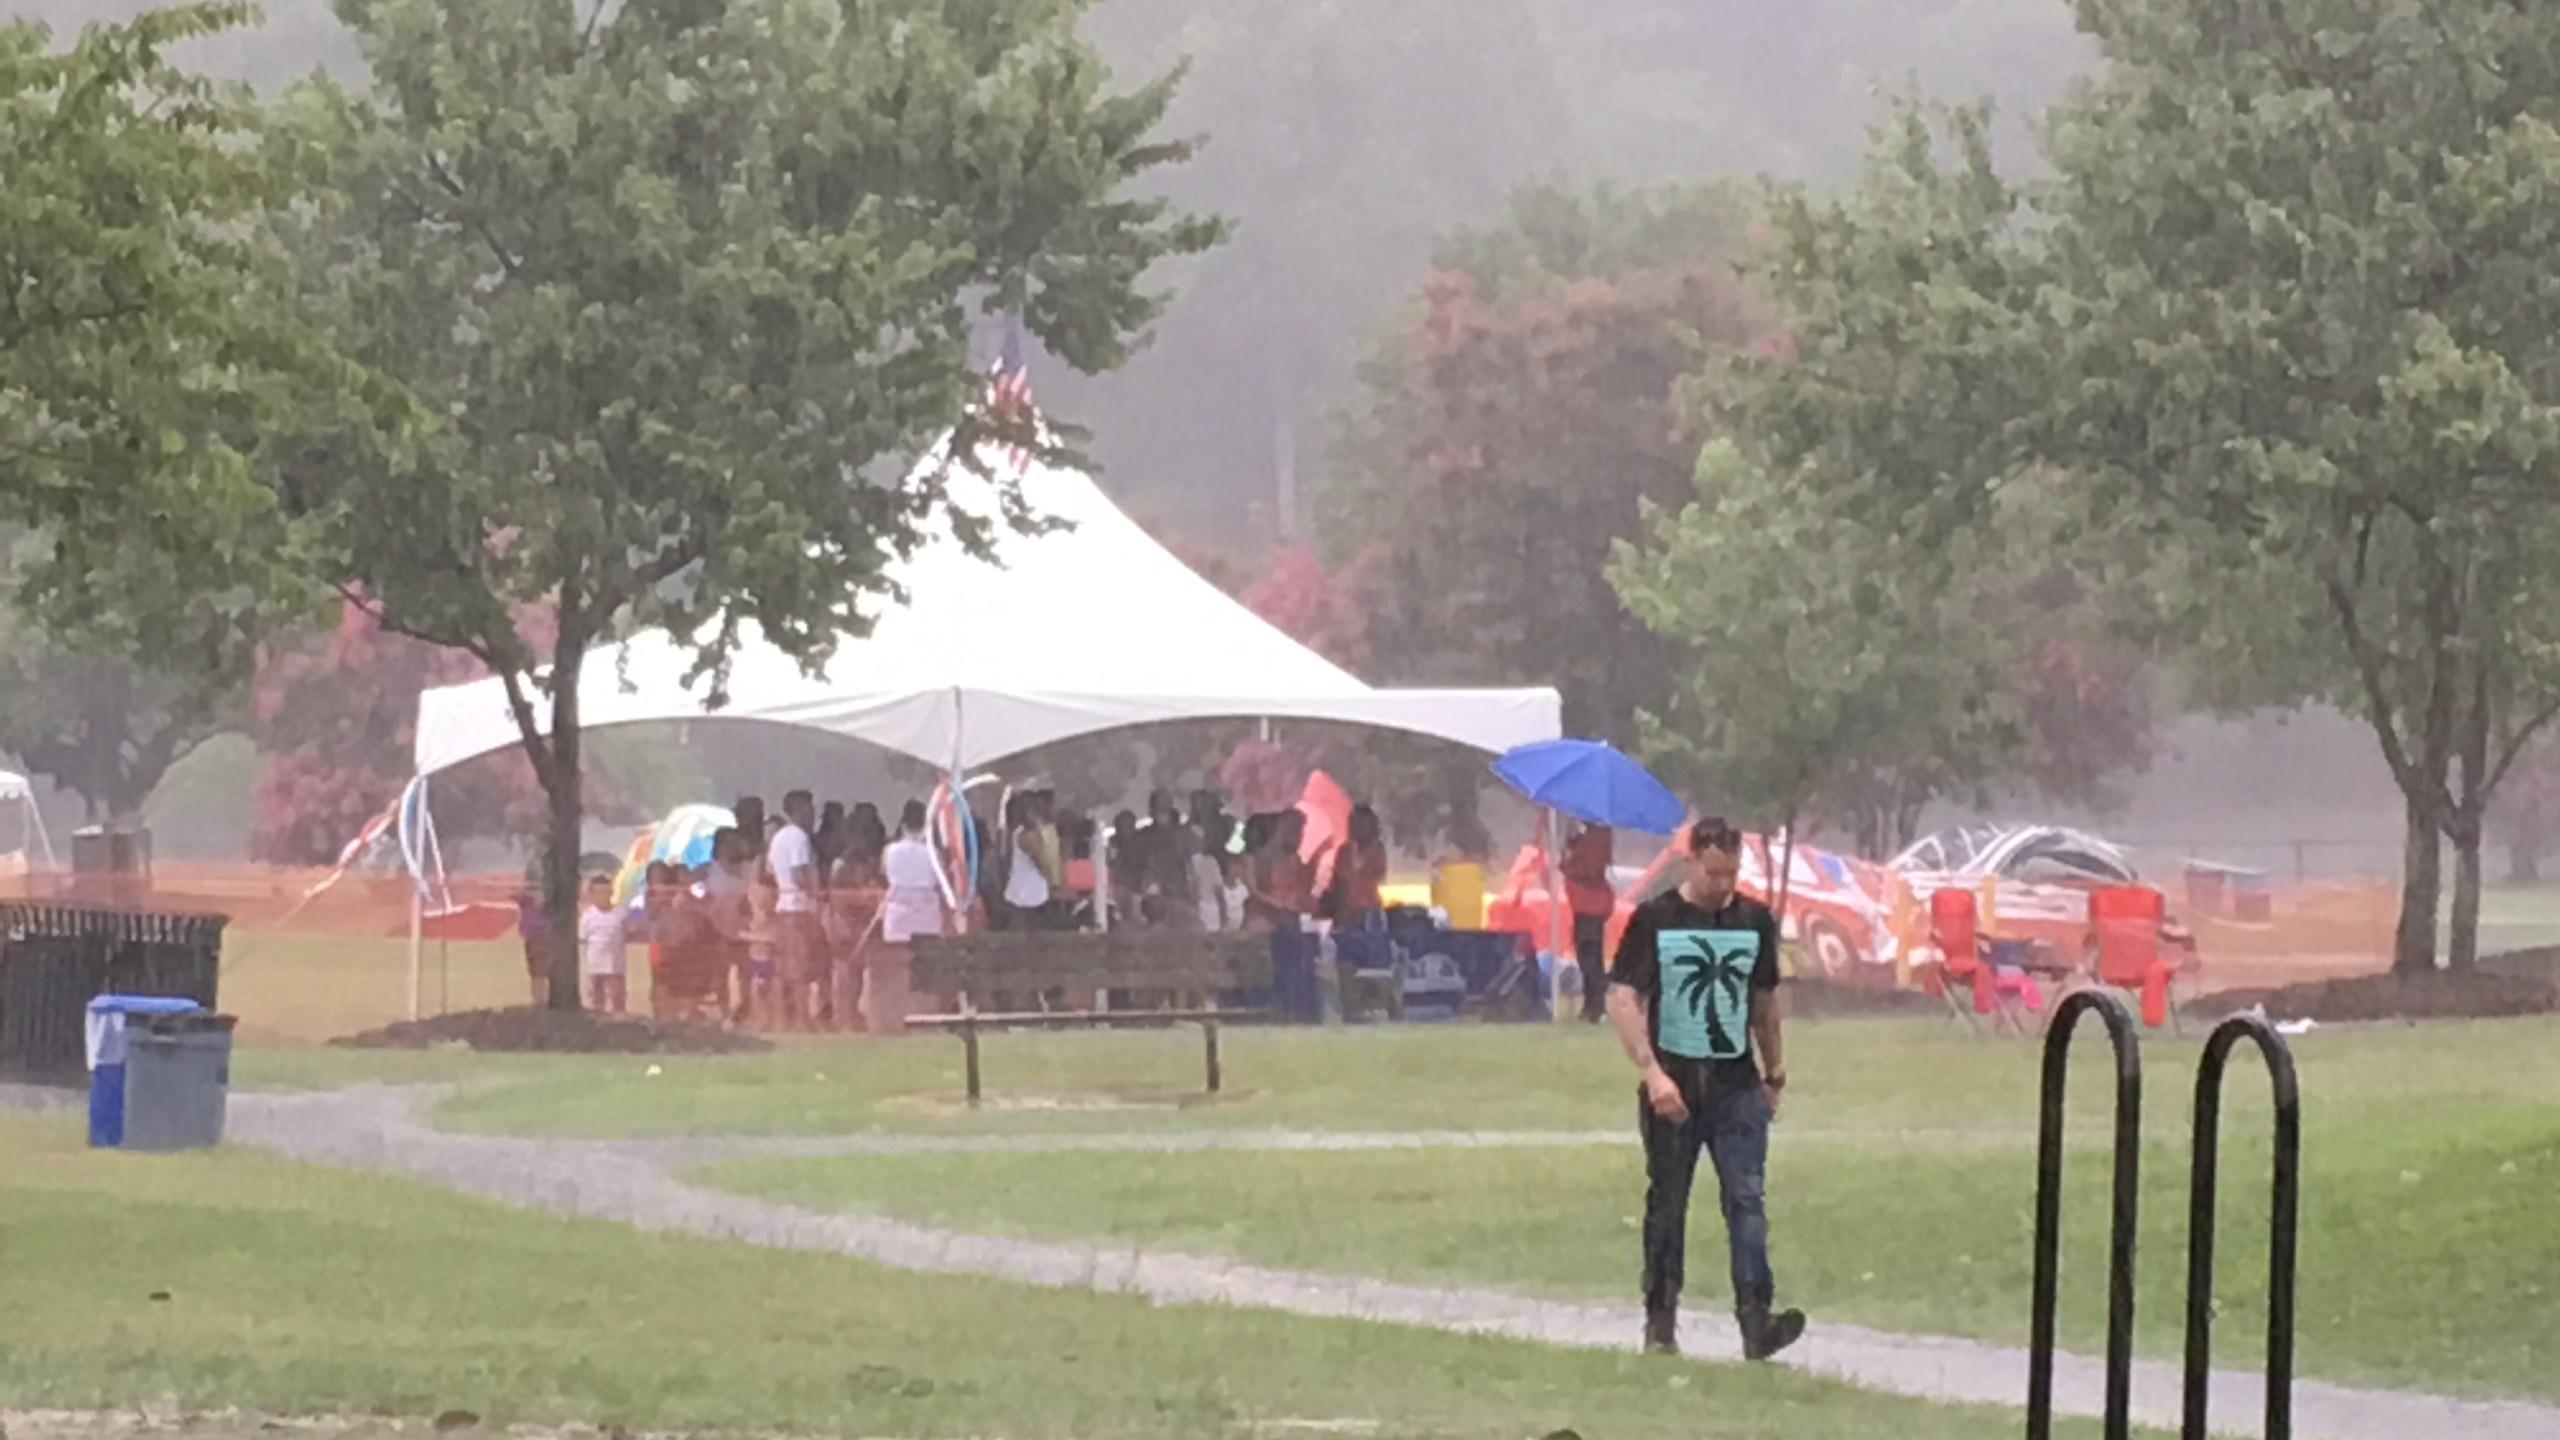 rain at greenville jaycee celebration_432274